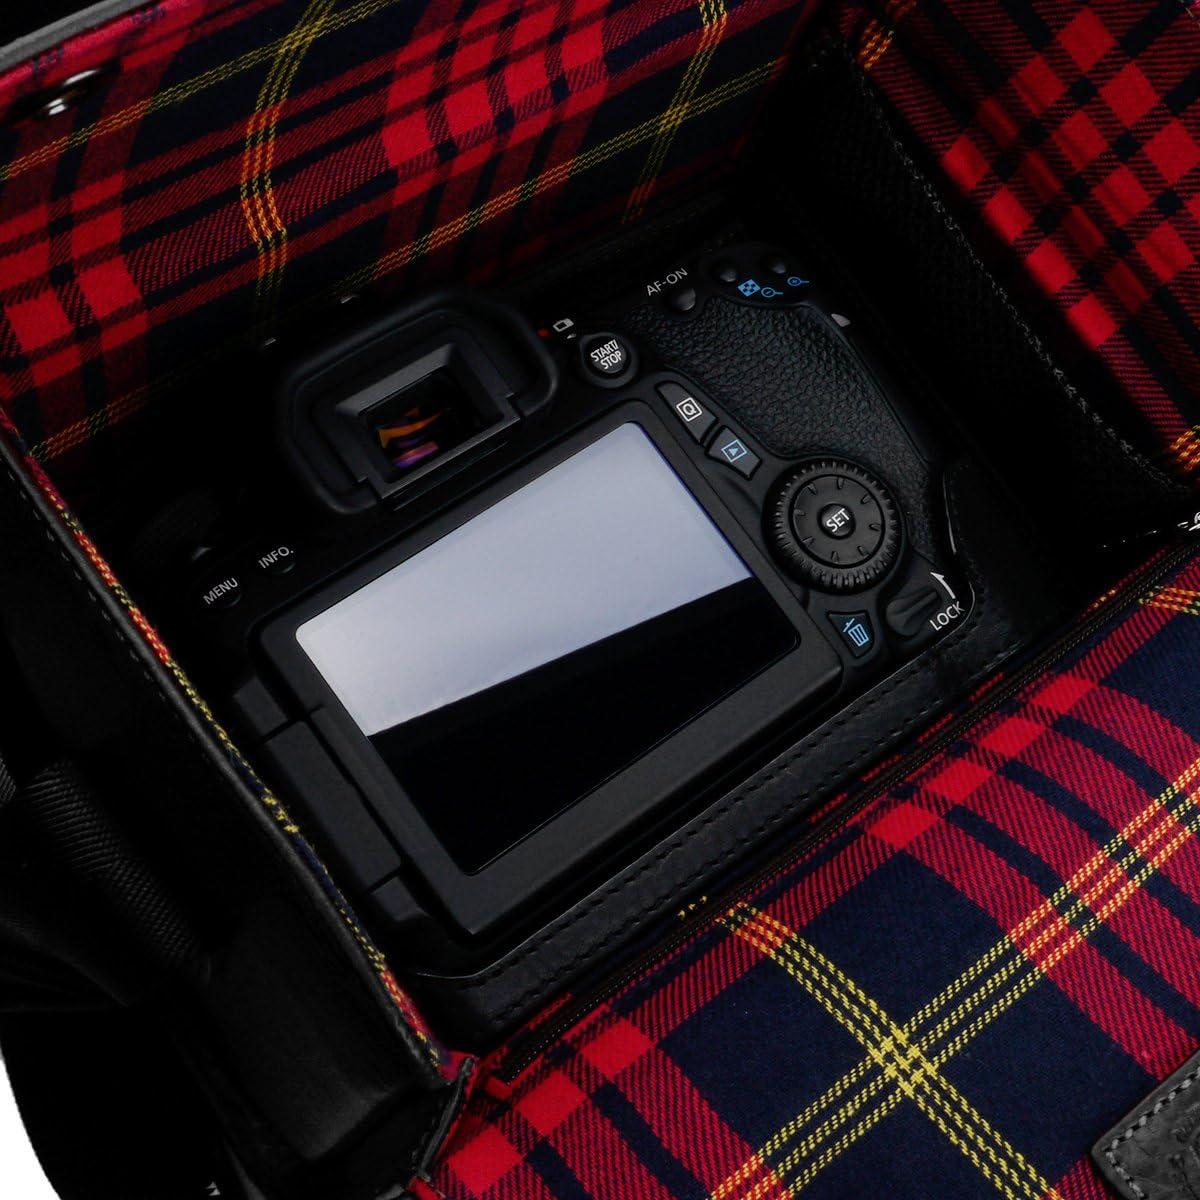 Gariz BL-NZBMBK Black Label Leather Camera Bag For Mirrorless DSLR Cameras Medium Black